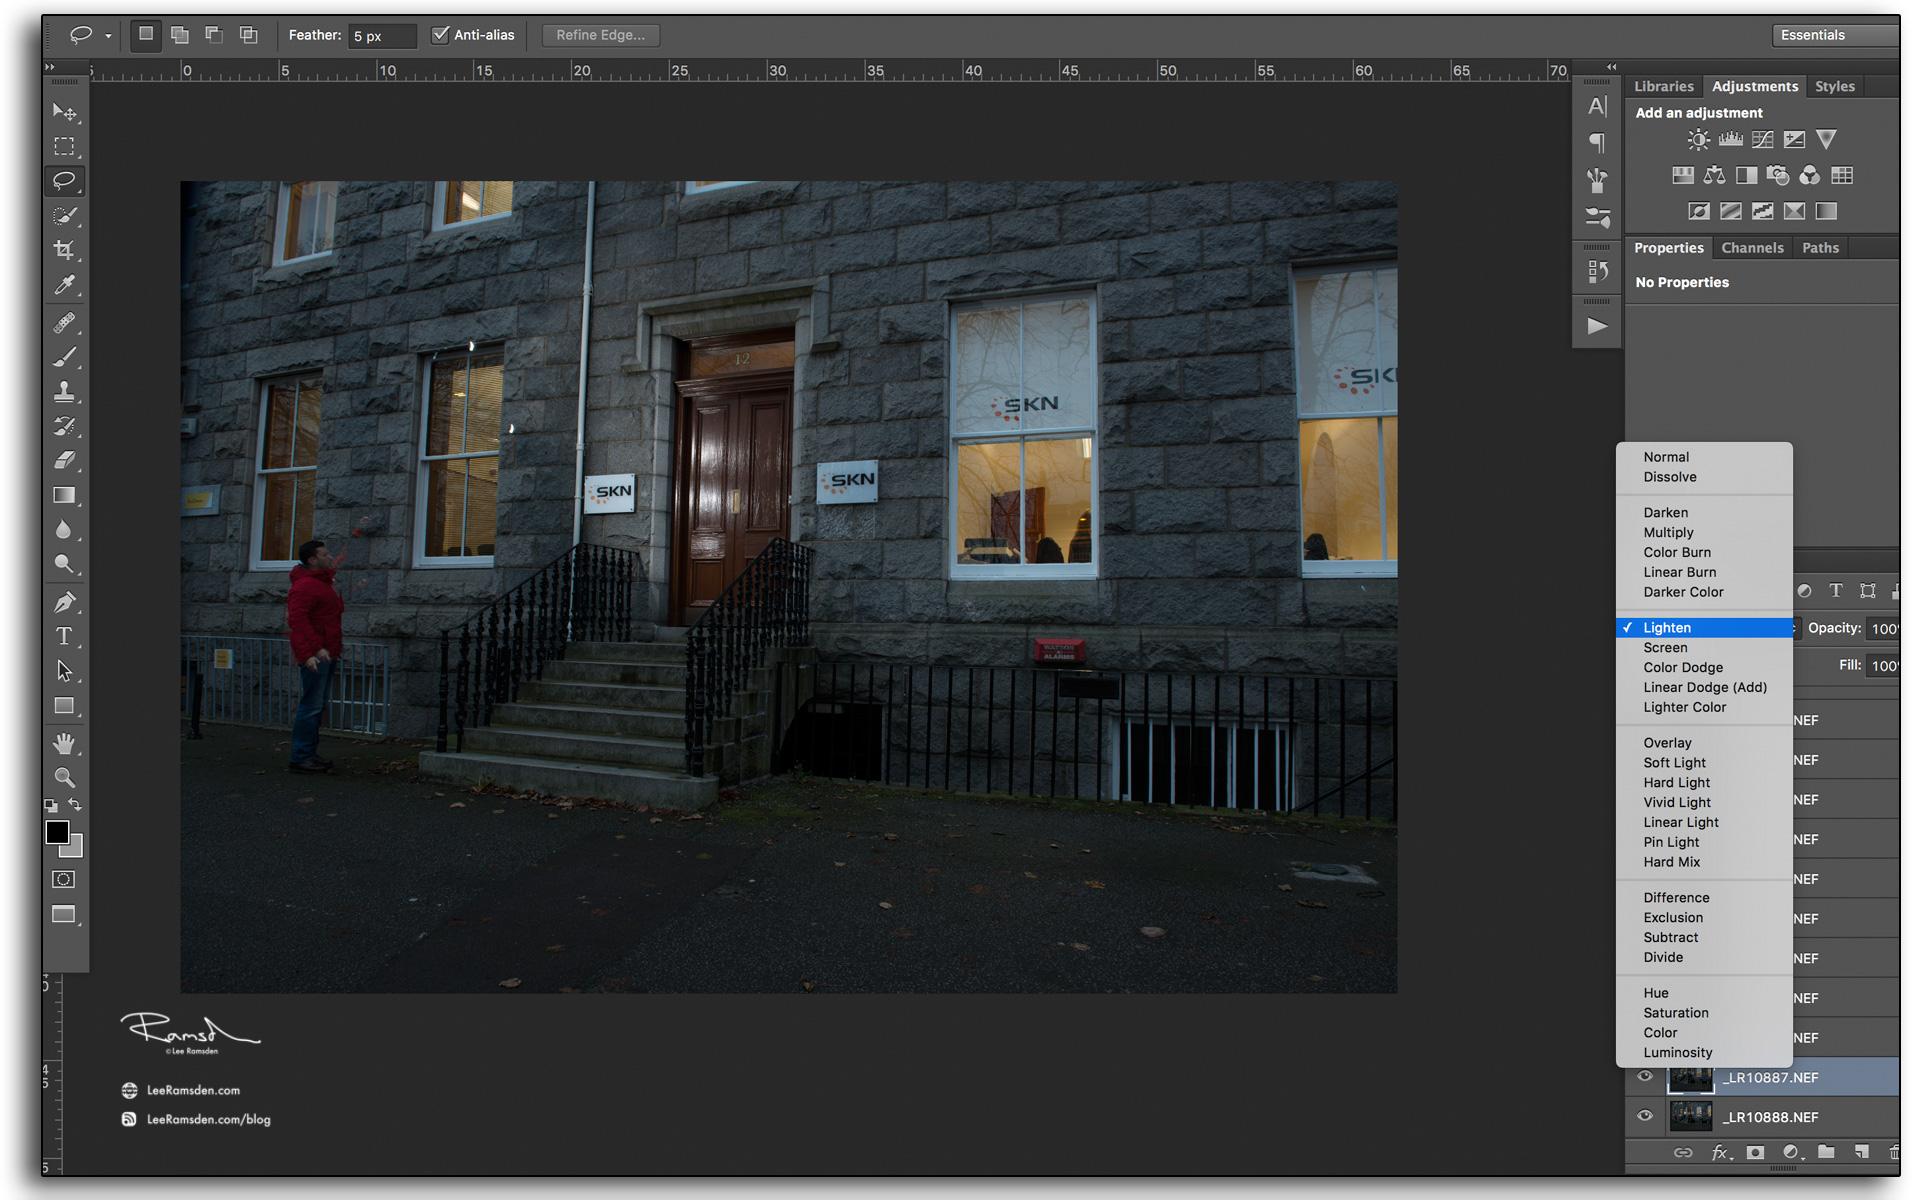 06 using lighten blend mode in photoshop CC